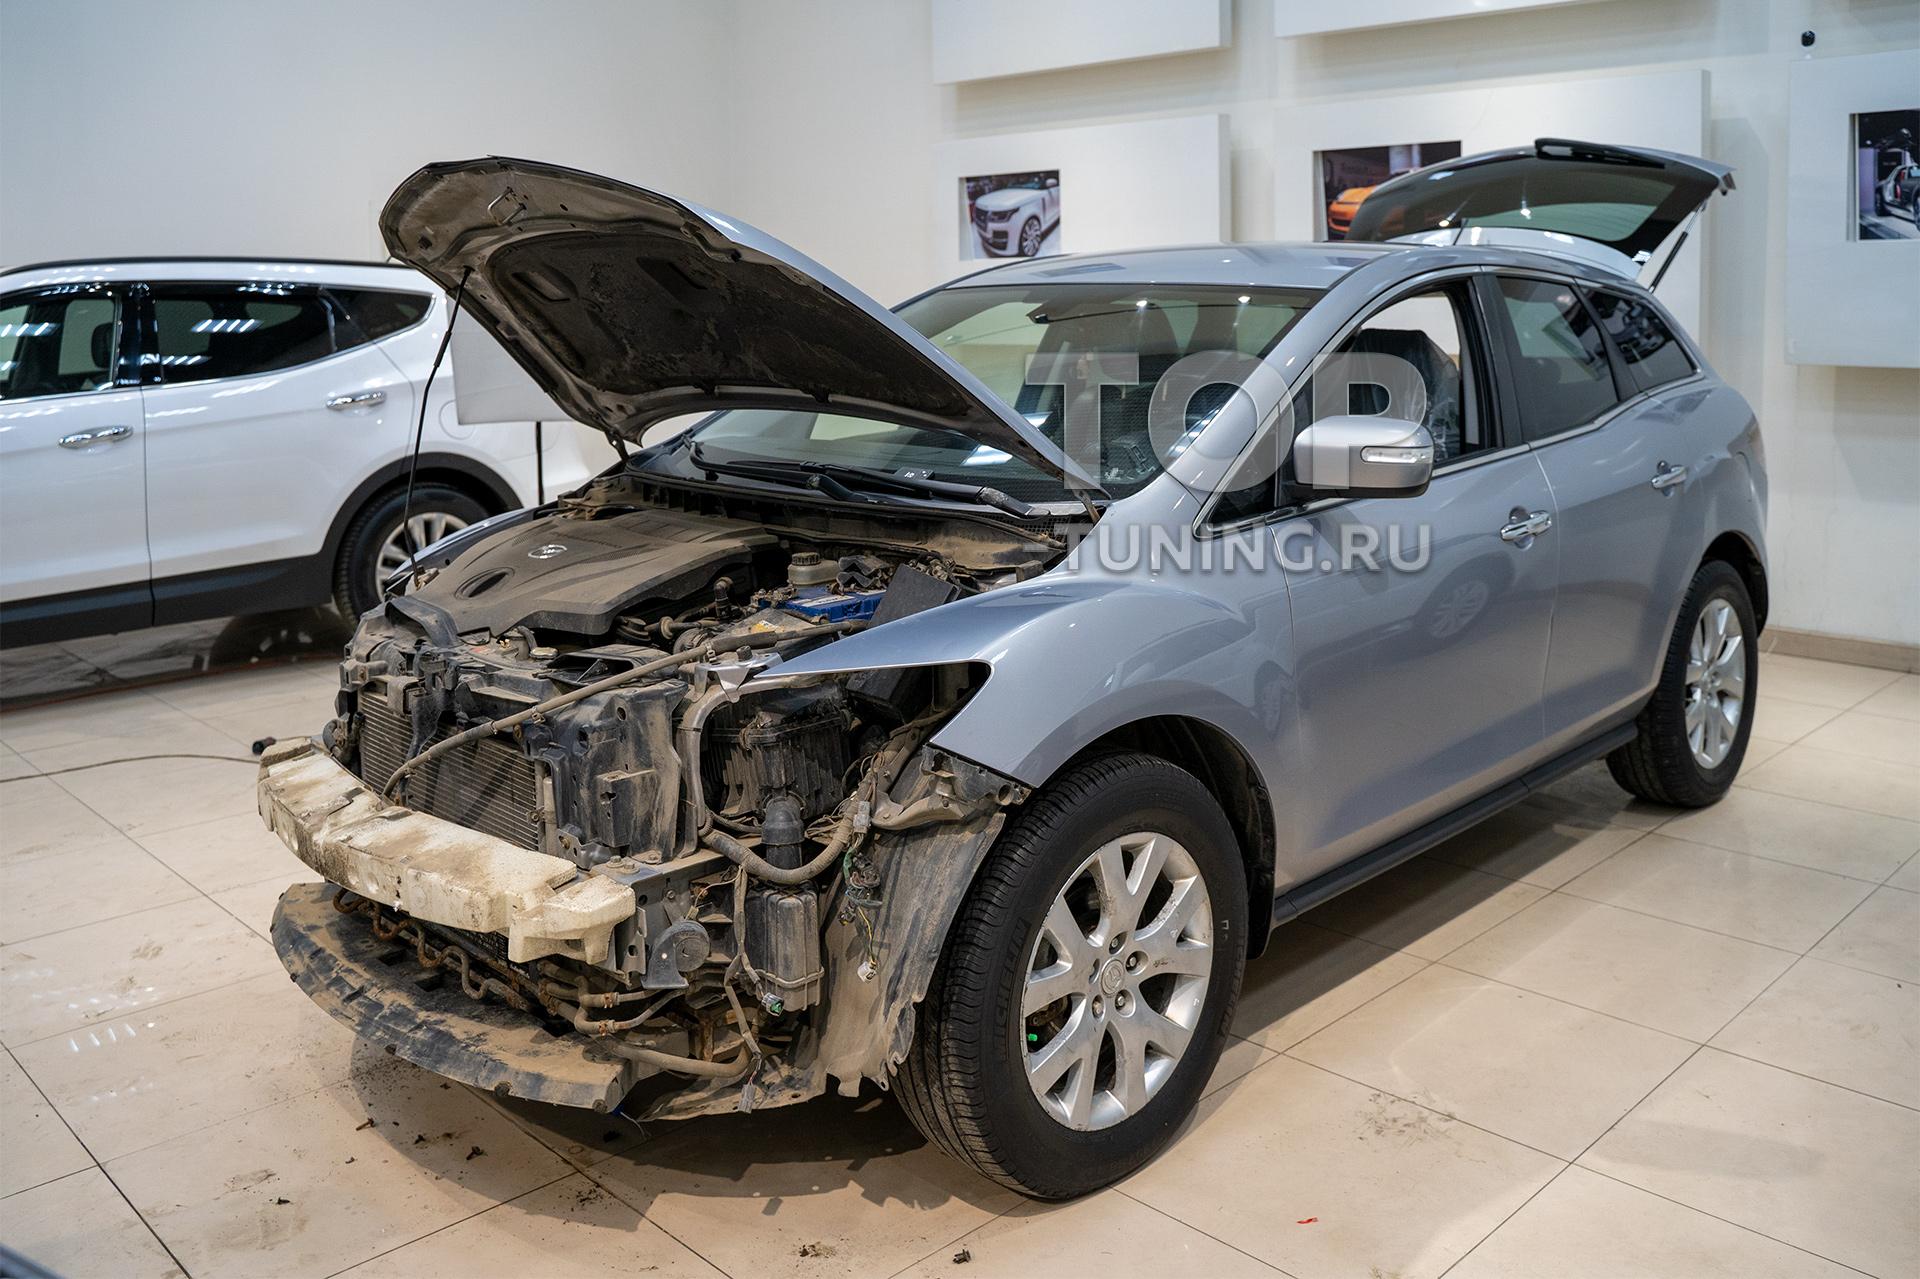 103888 Доработка оптики в Mazda CX-7 (замена линз) Bi Xenon